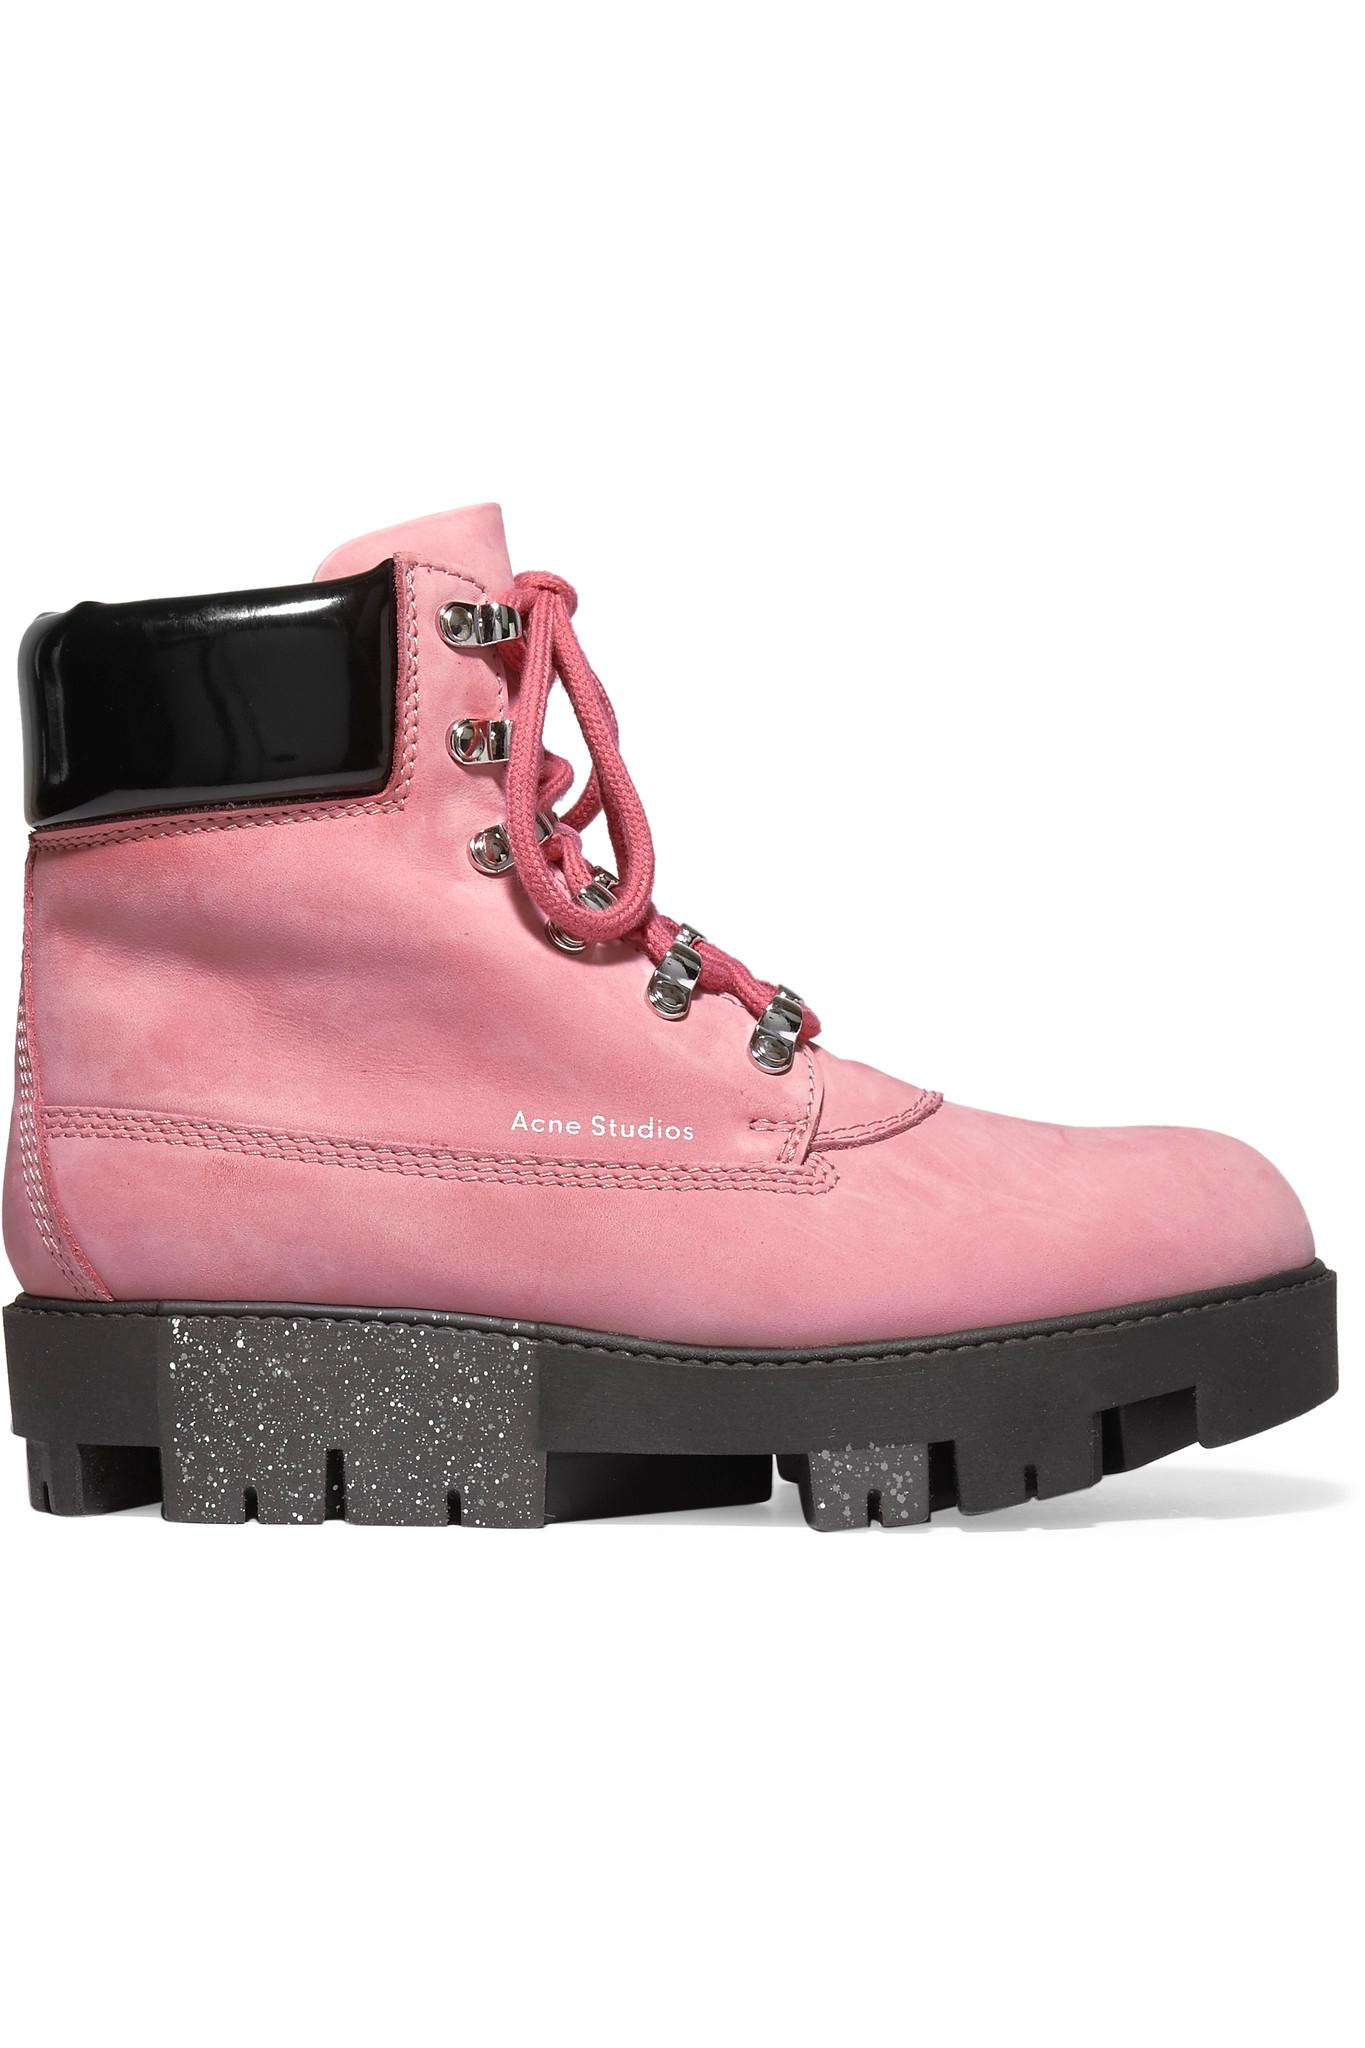 da385f59766 Acne Studios Multicolor - 'telde' Hiking Boots - Women - Leather/patent  Leather/rubber - 39